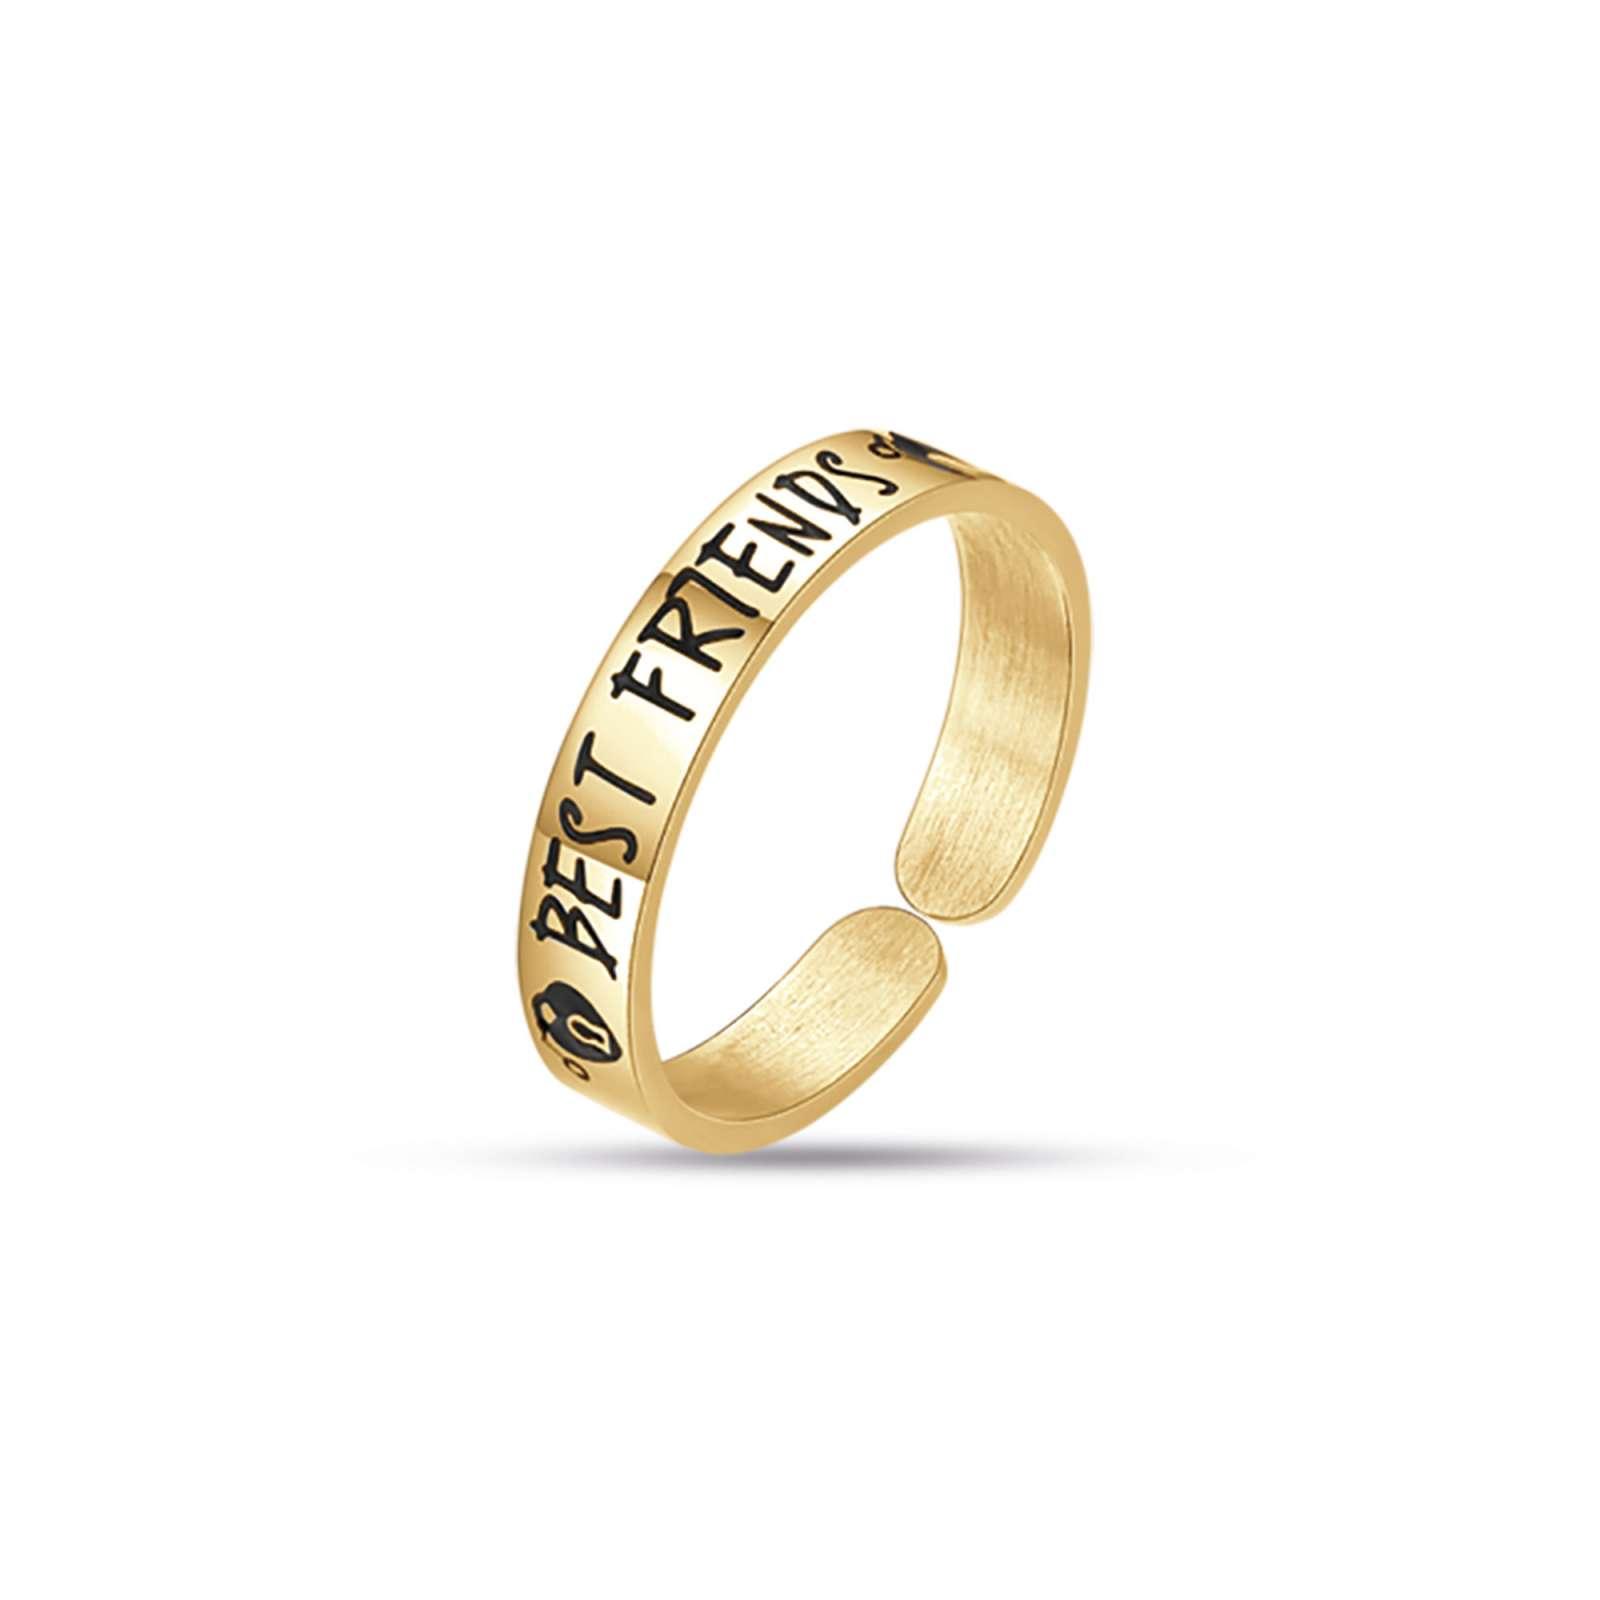 Luca Barra - Anello in acciaio gold best friends